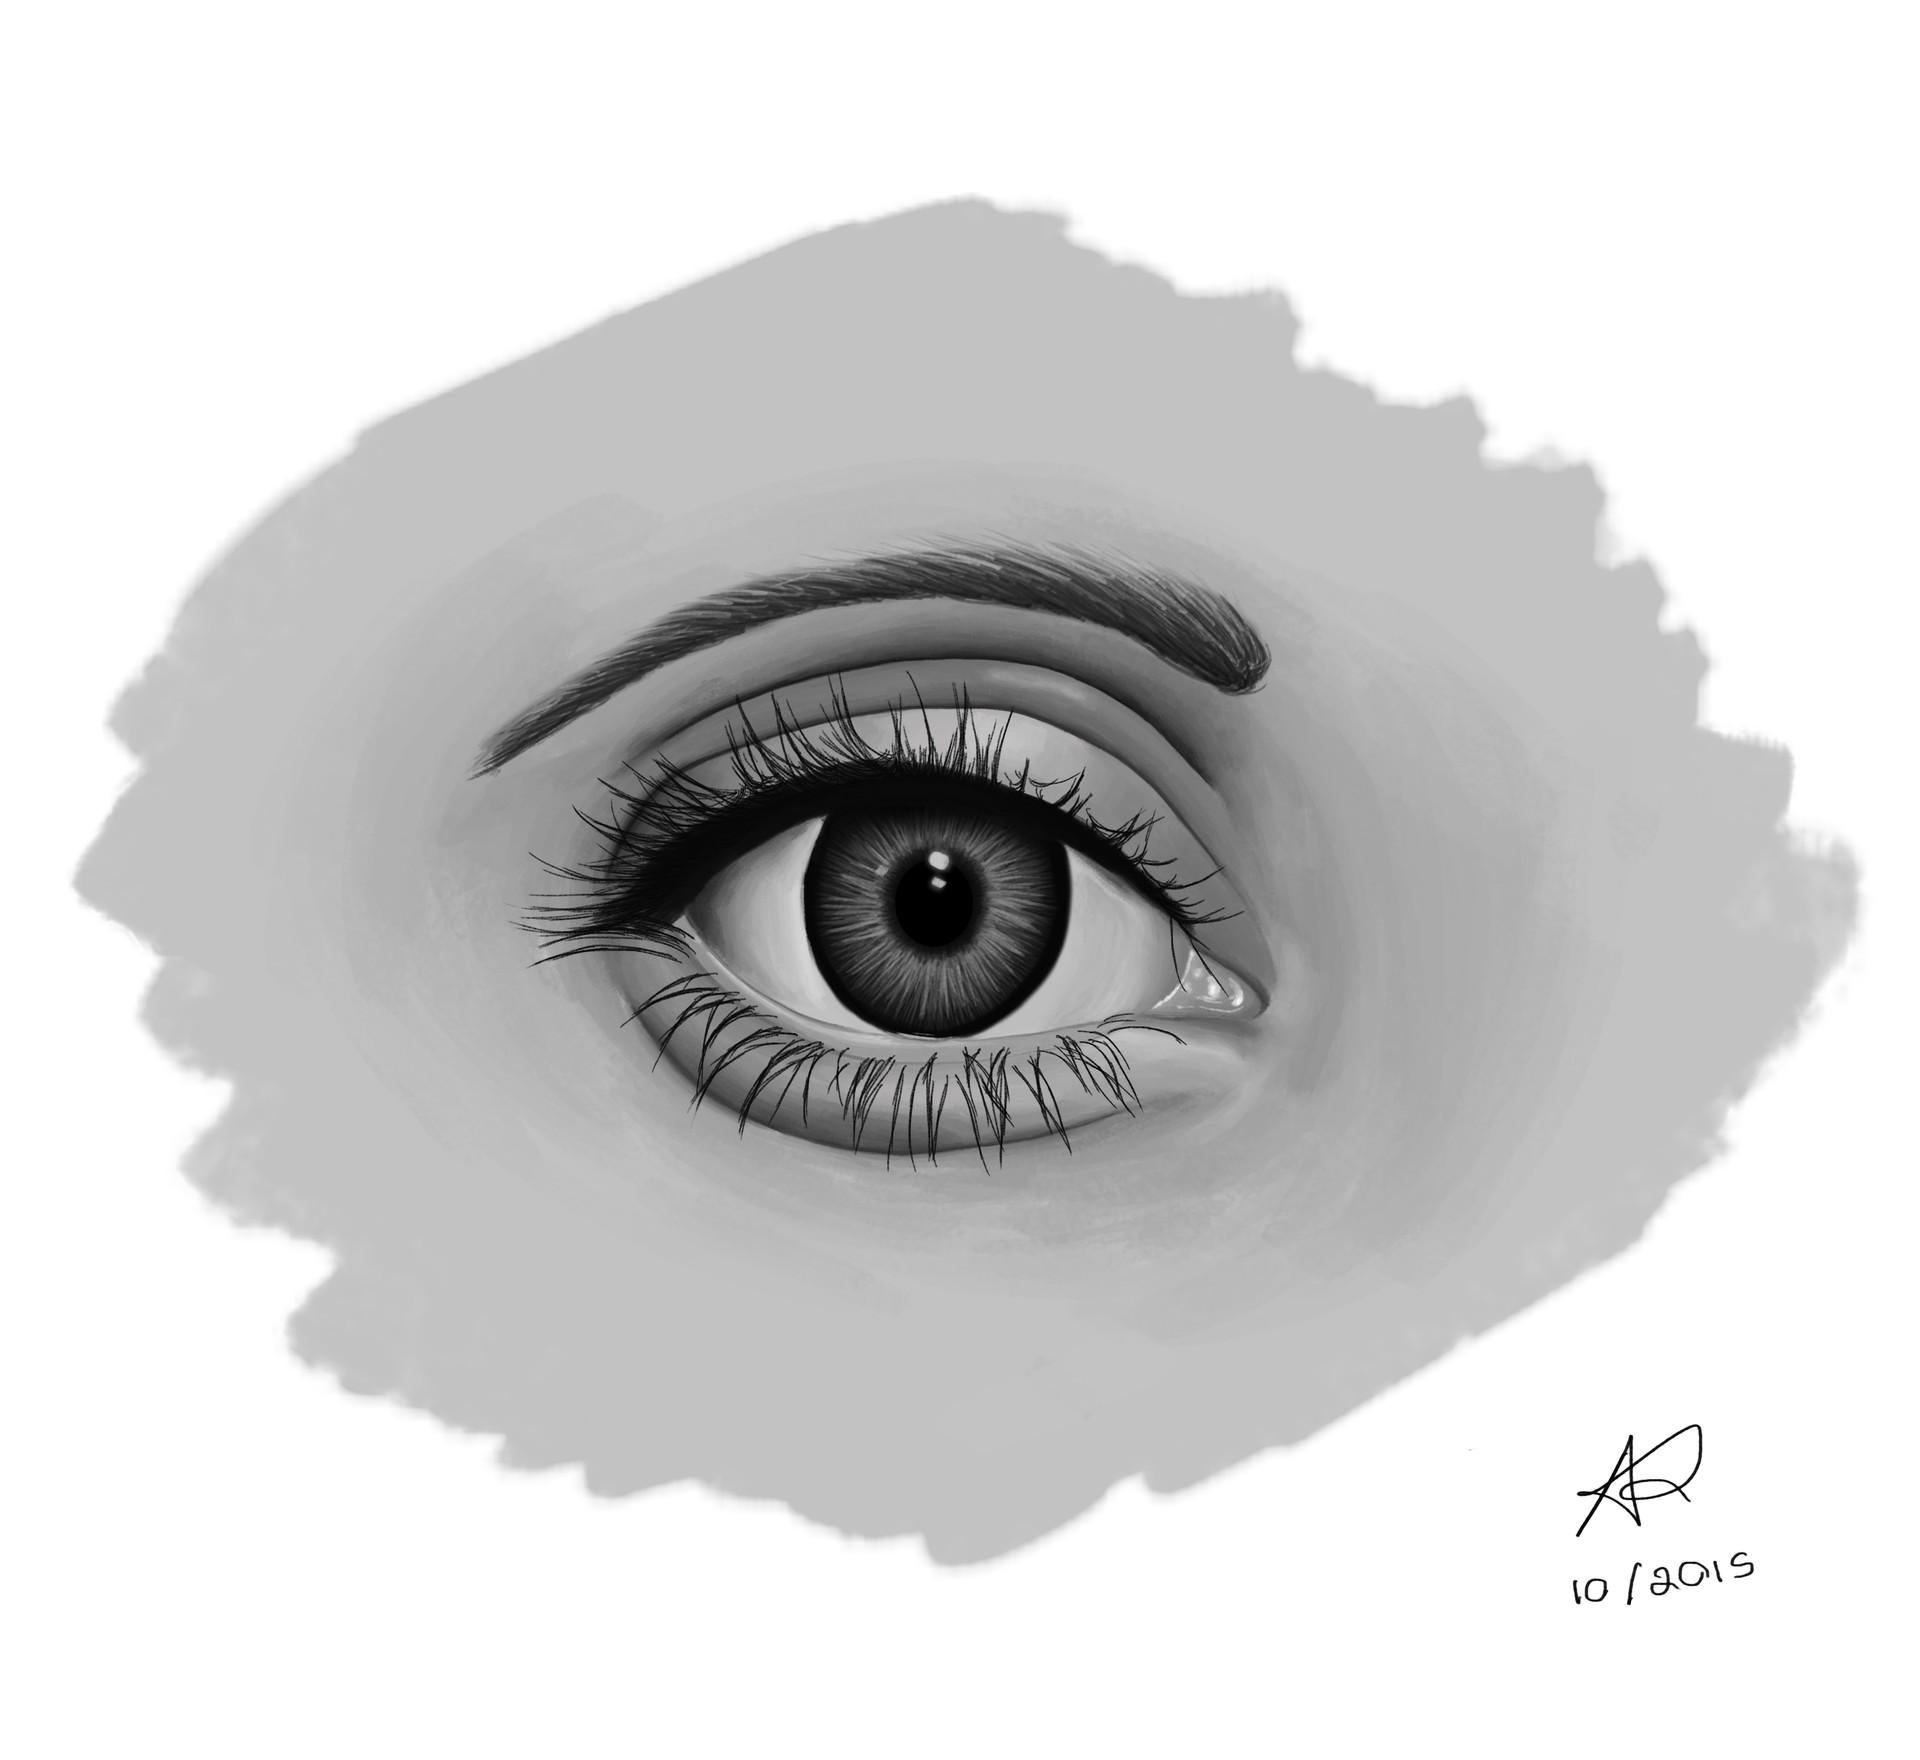 Digi nana eye